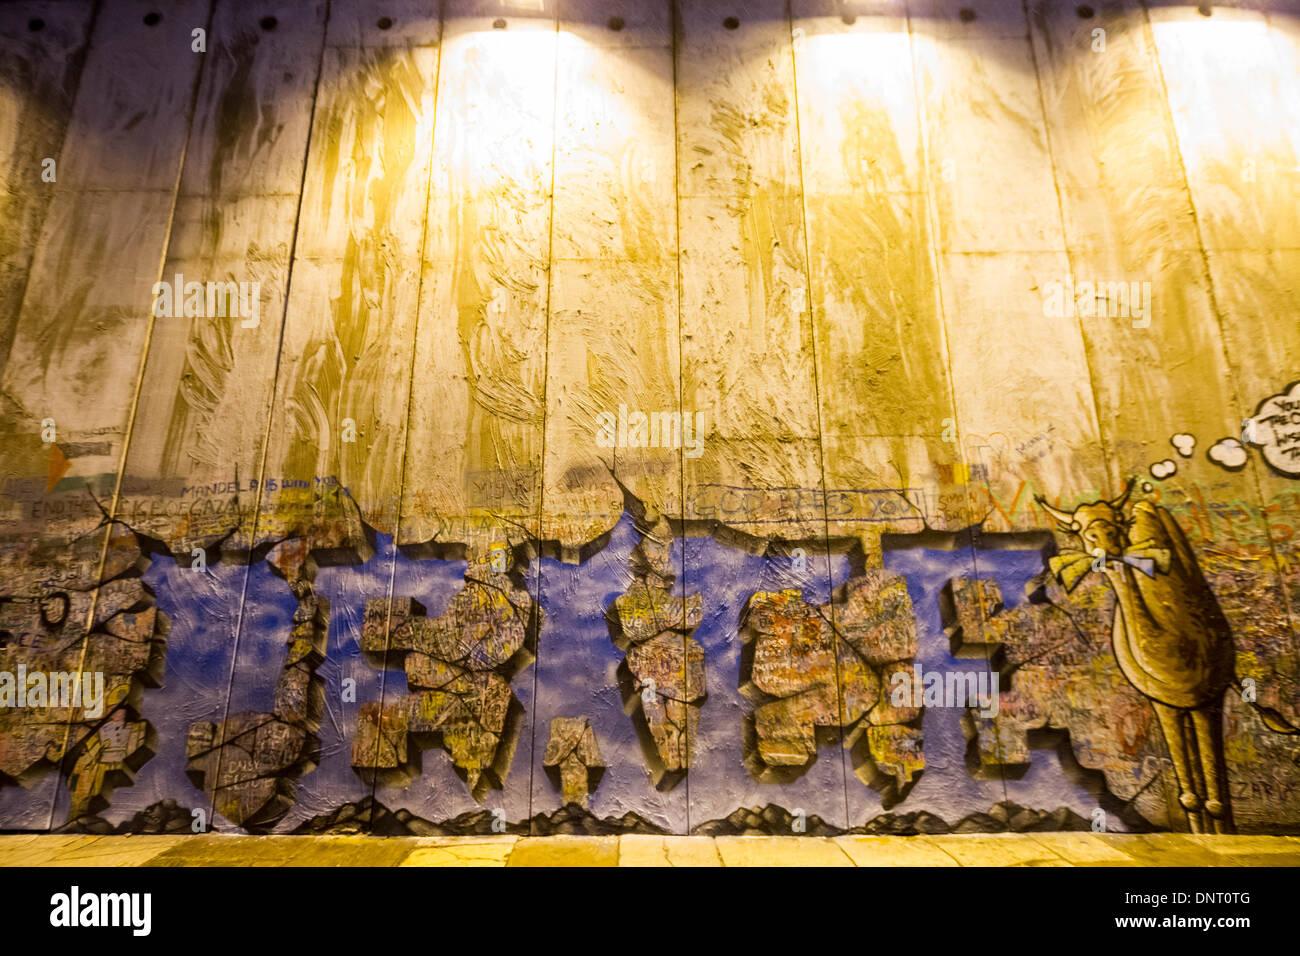 Bethlehem Wall Art Installation Stock Photos & Bethlehem Wall Art ...